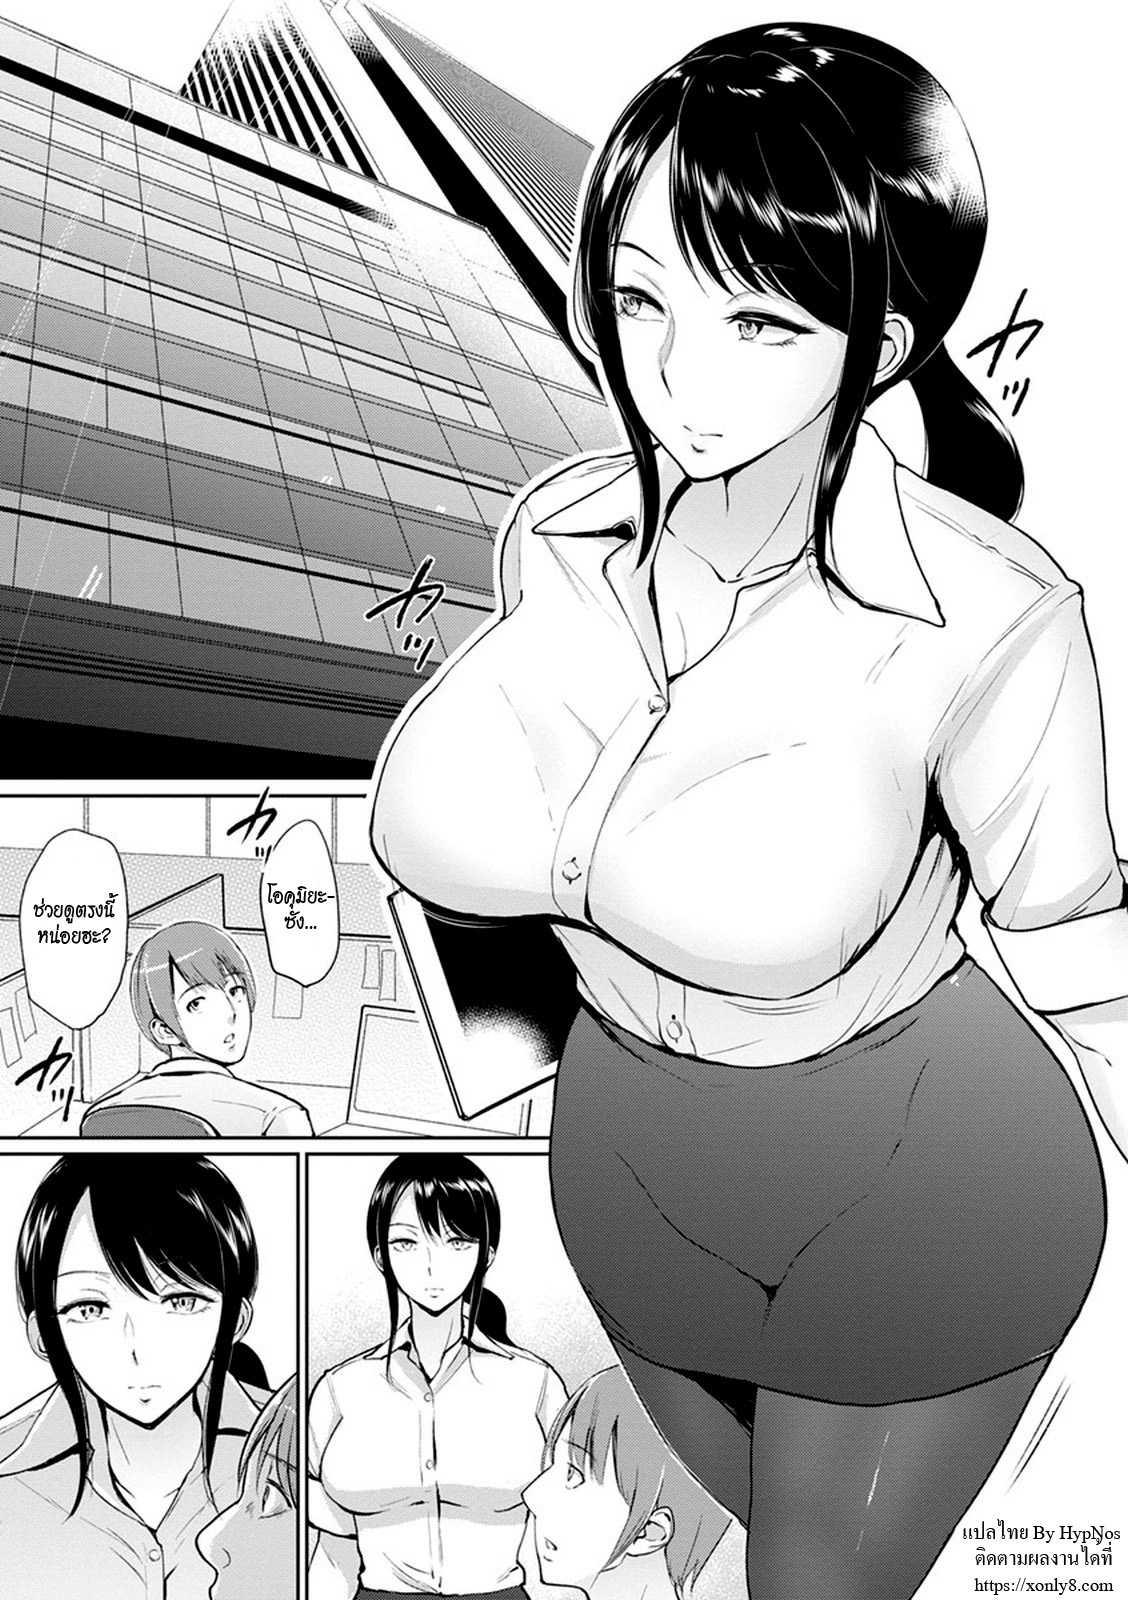 bifidus-okumiya-san-wa-otearai-ni-iru-mrs-okumiya-is-in-the-restroom-kimi-o-sasou-uzuki-ana